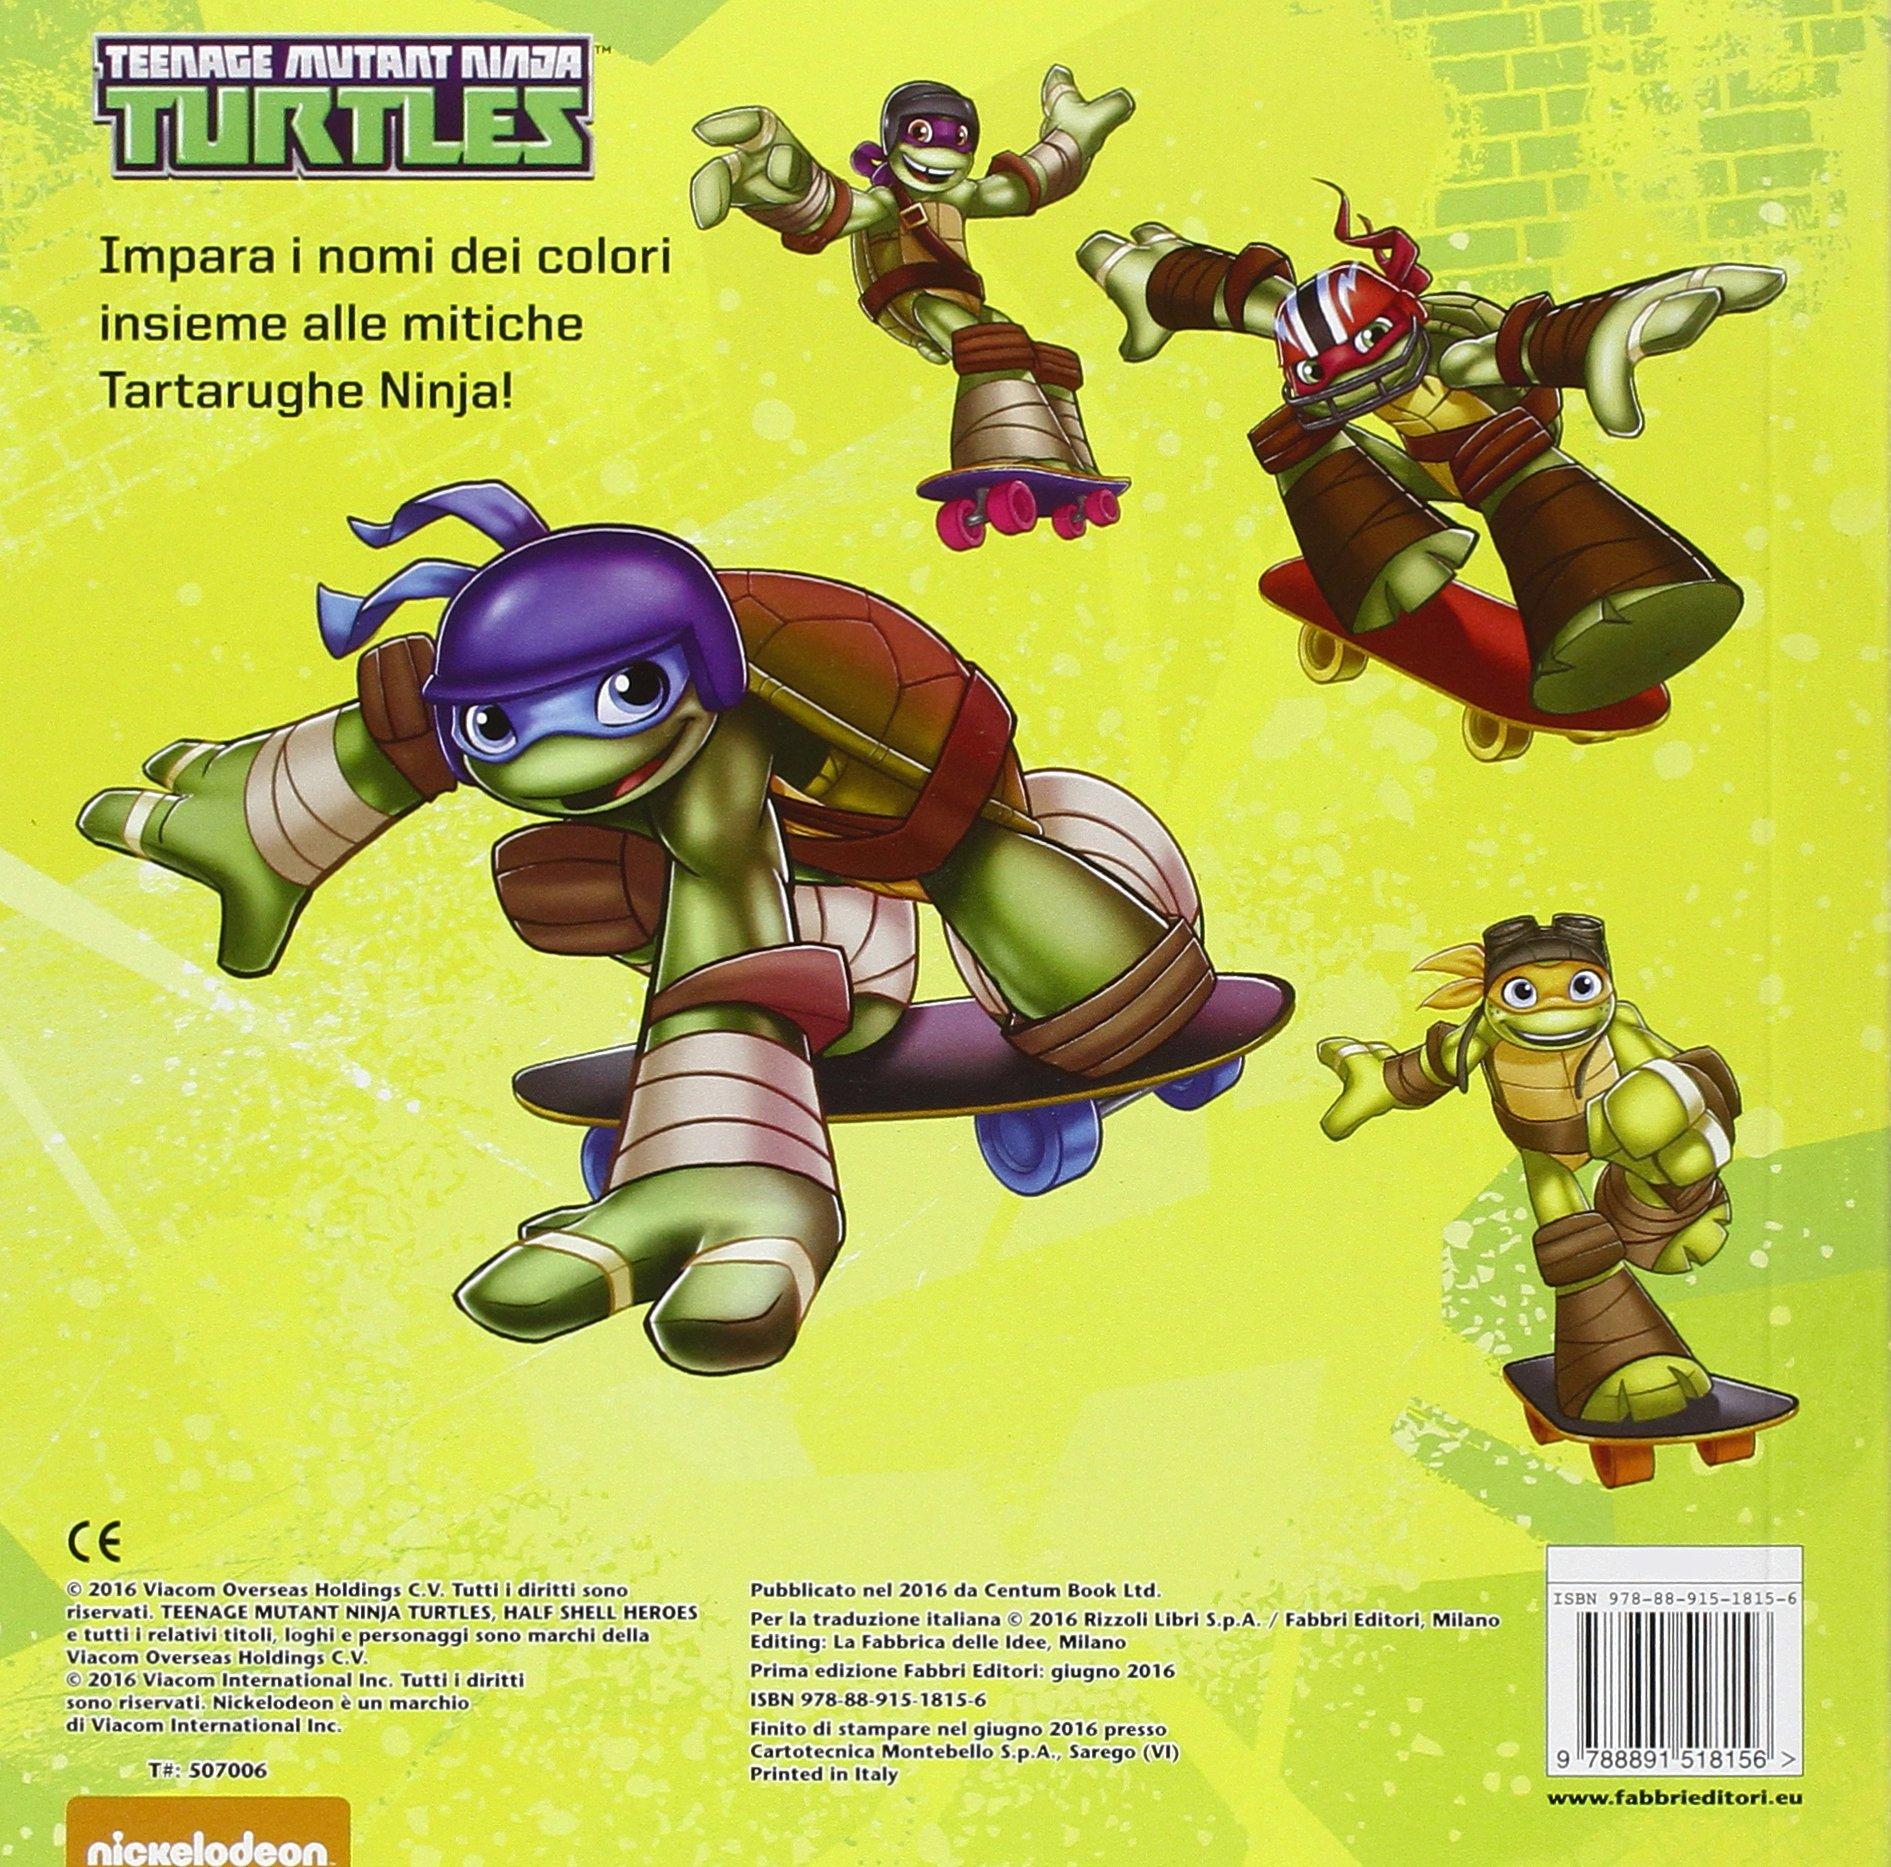 Colori da ninja. Half shell heroes. Teenage mutant ninja ...